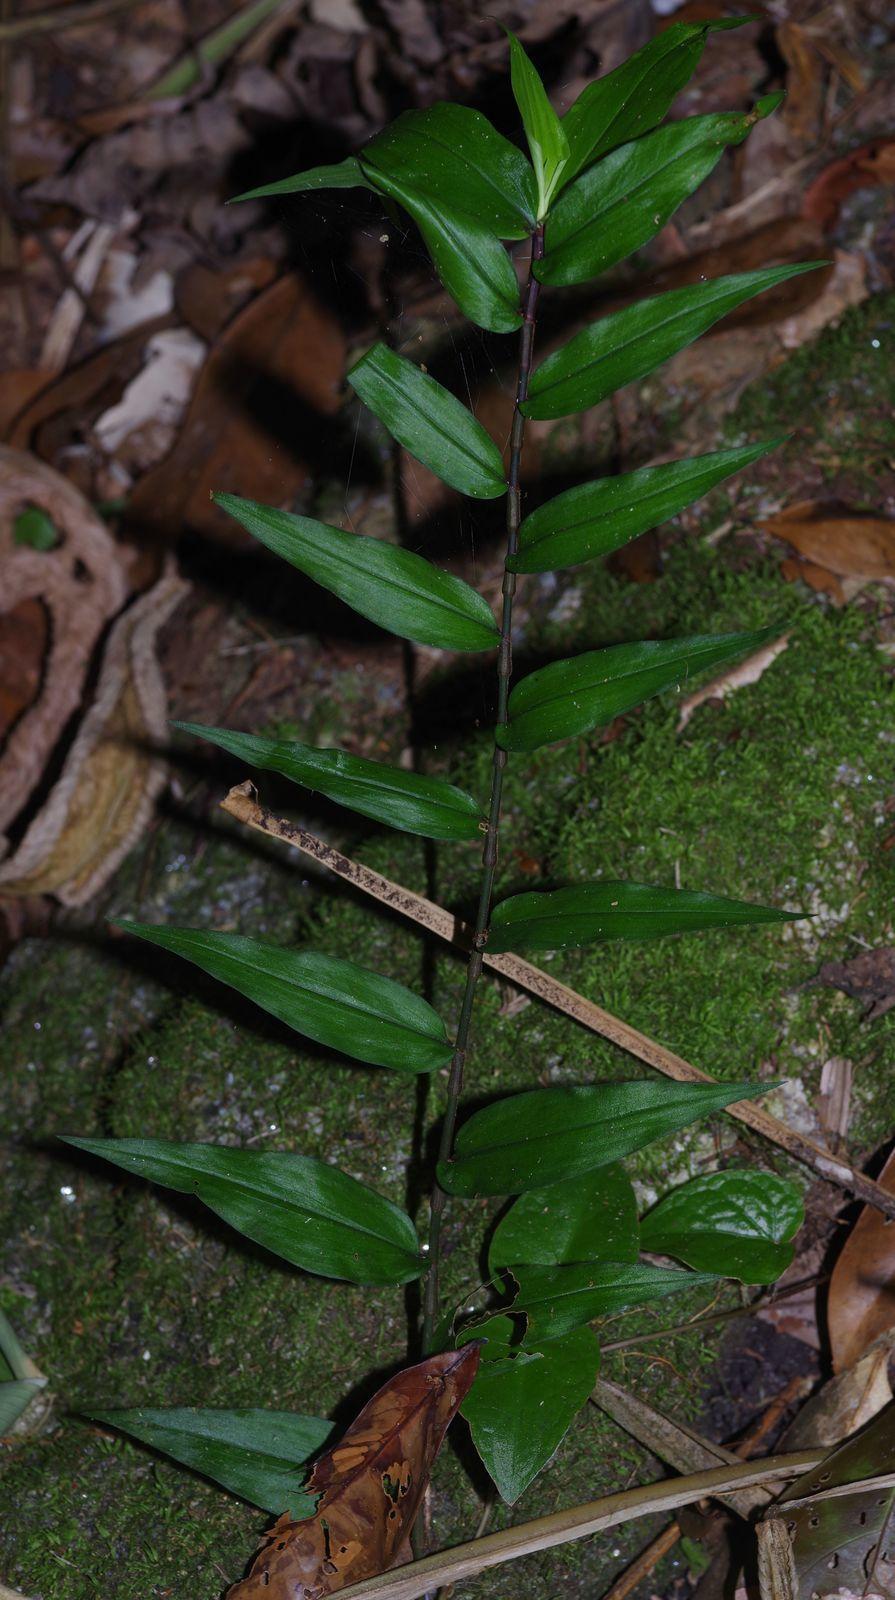 Commelina rufipes var. glabrata